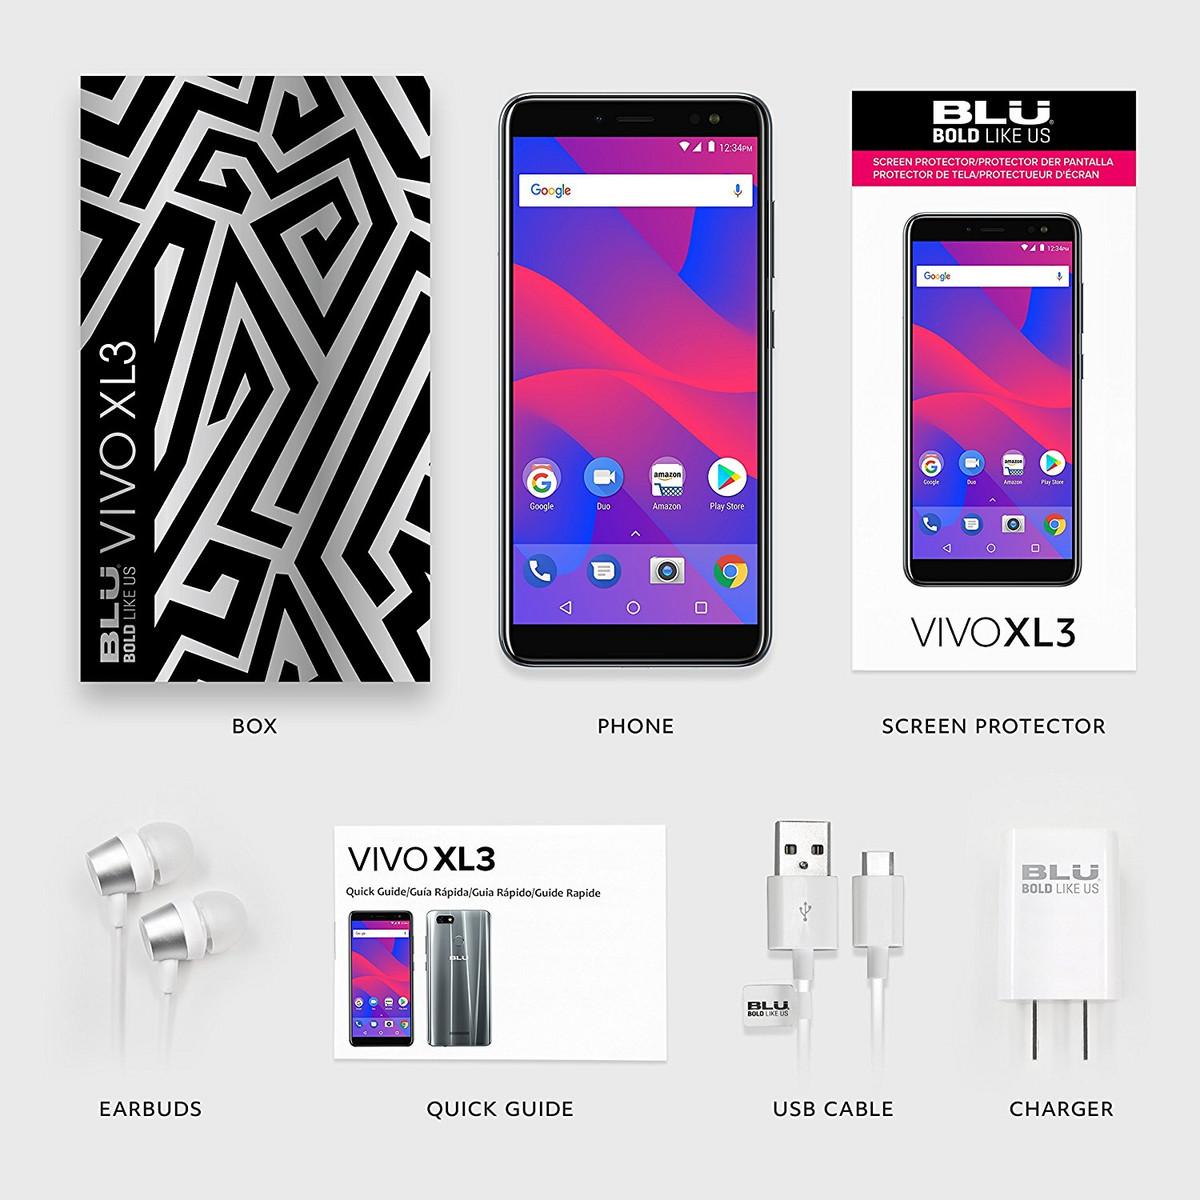 5 5 Inch Blu Vivo Xl 3 Hits Amazon With Android Oreo